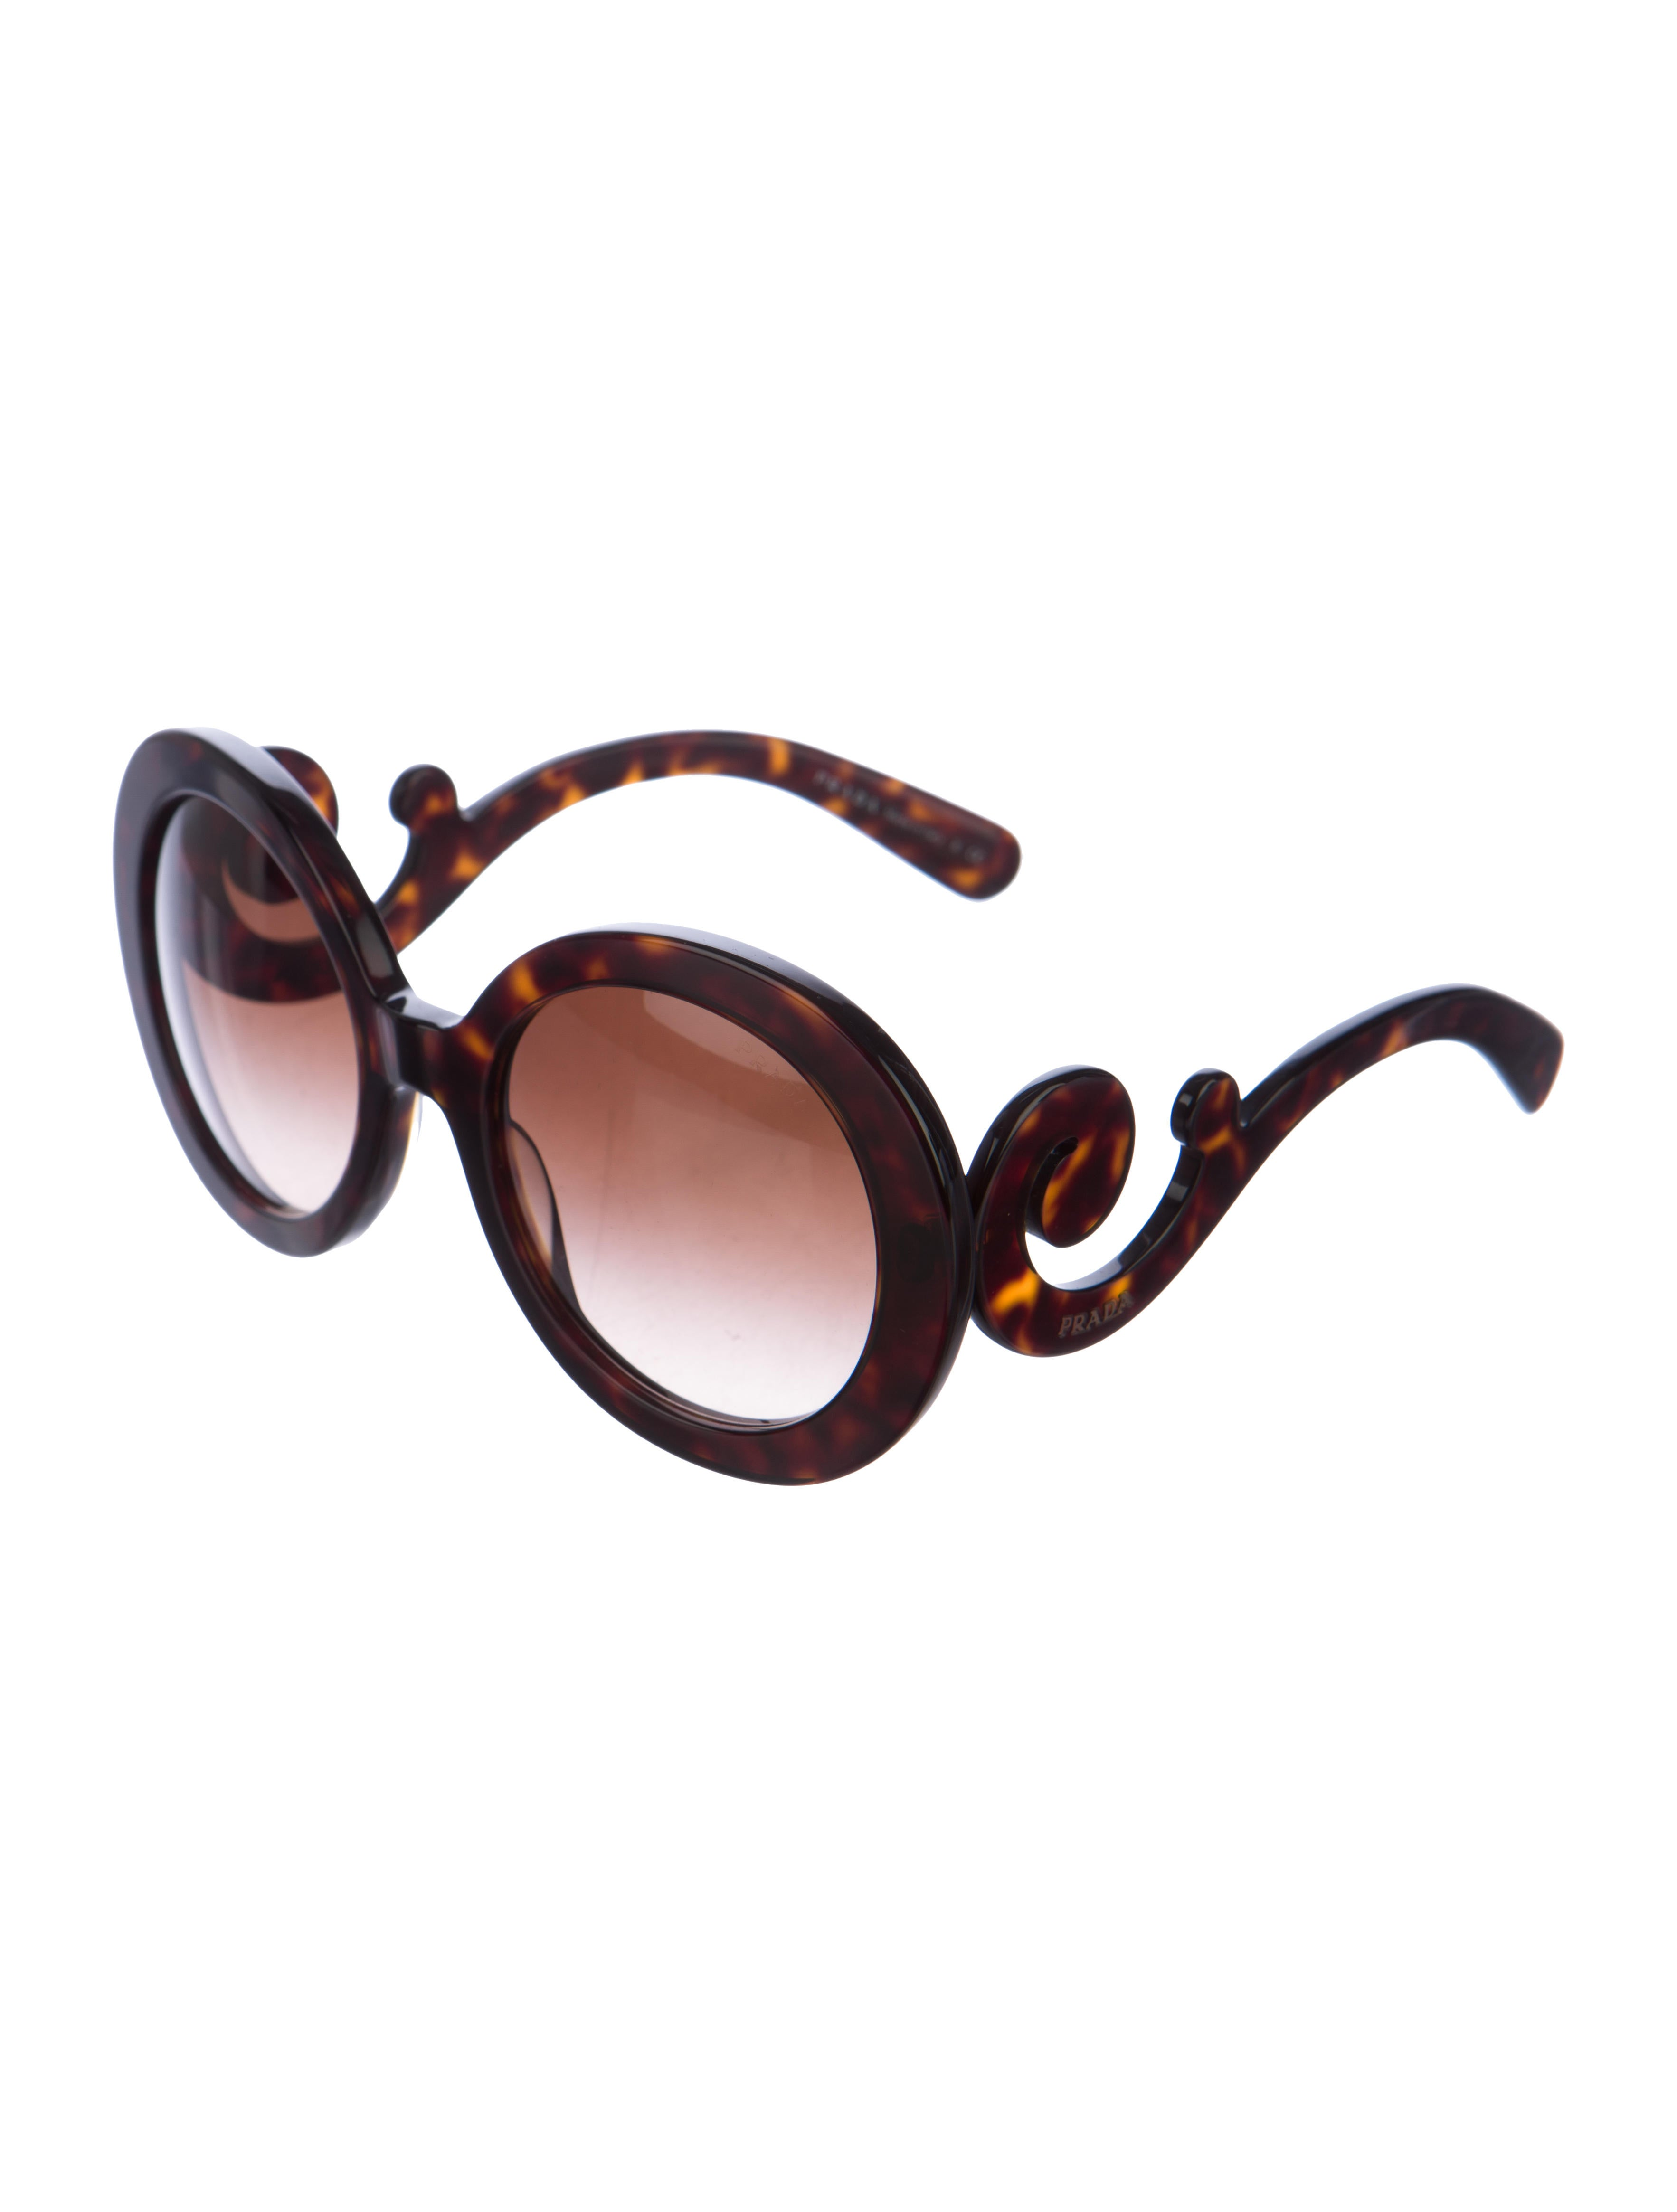 Prada Baroque Sunglasses Real Vs Fake   David Simchi-Levi bb492558ce